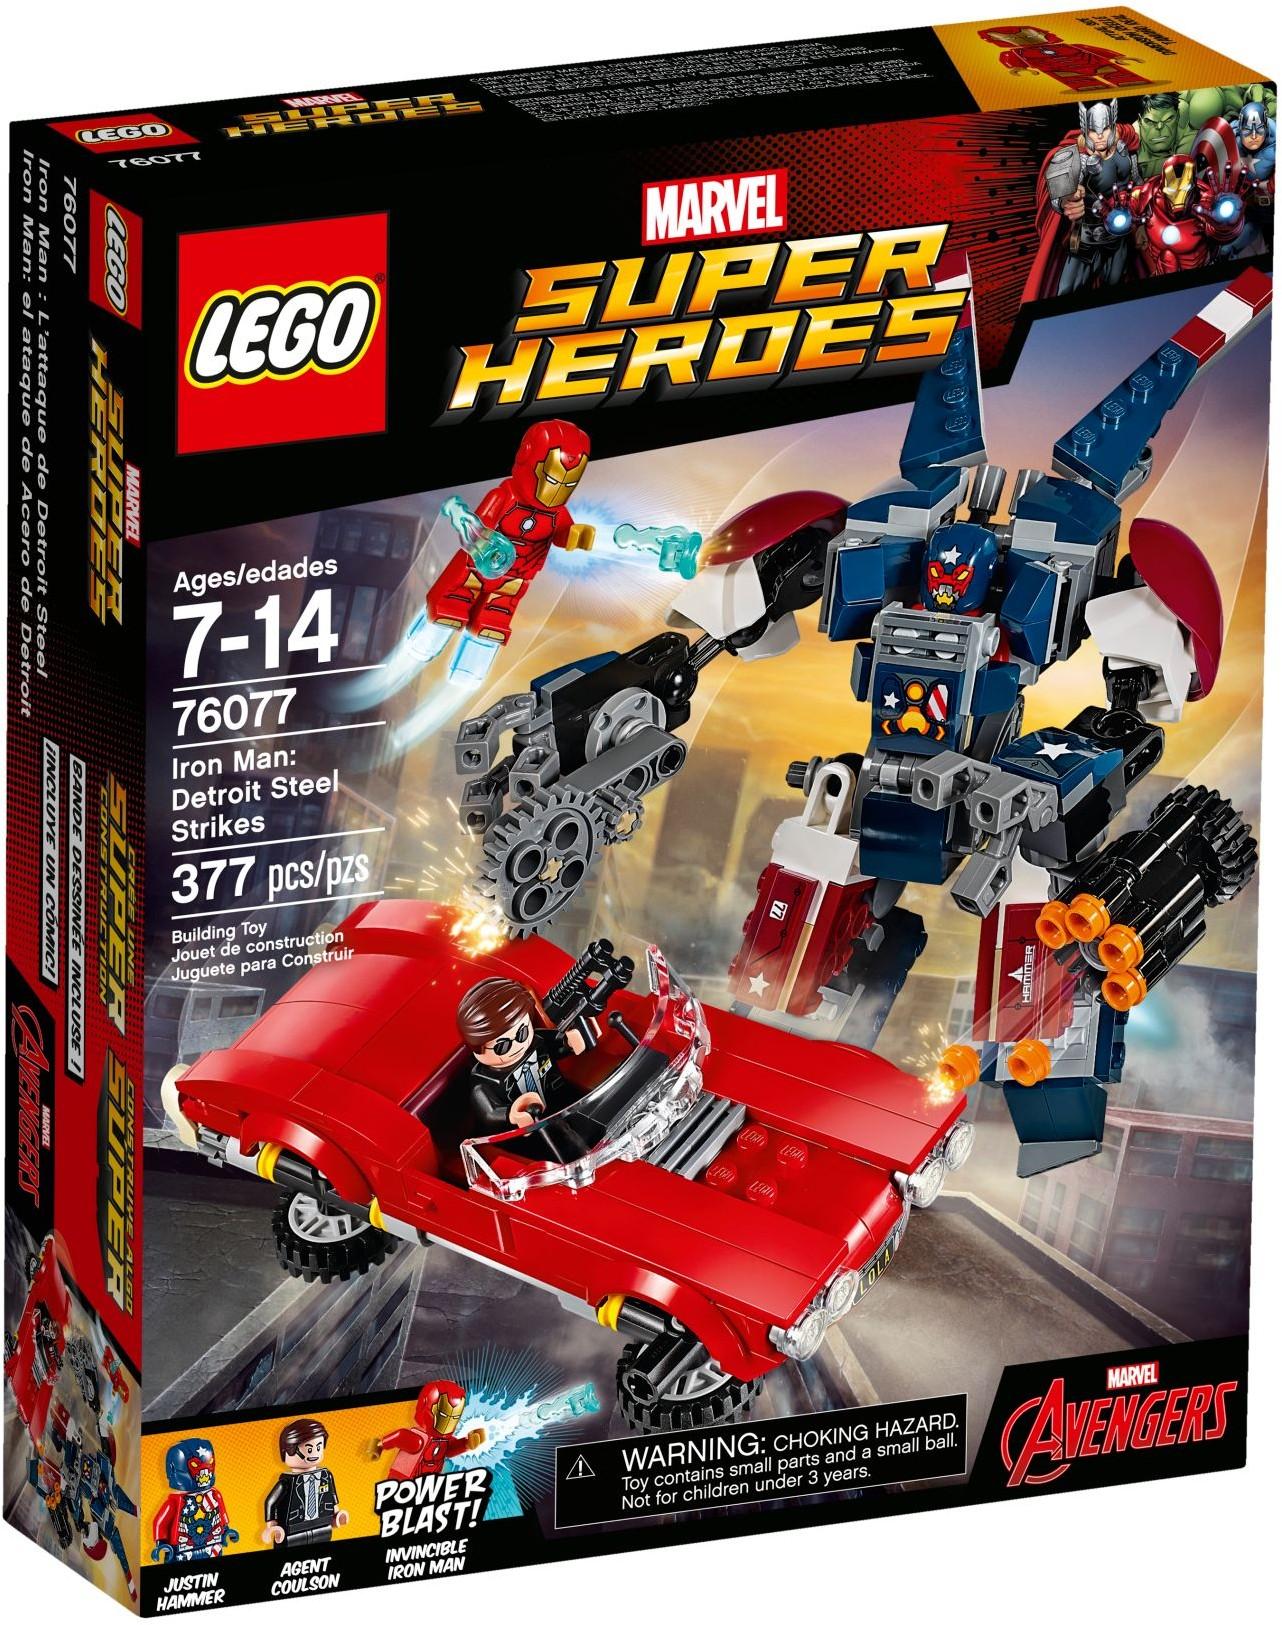 76077 LEGO Super Heroes Iron Man: Detroit Steel Strikes